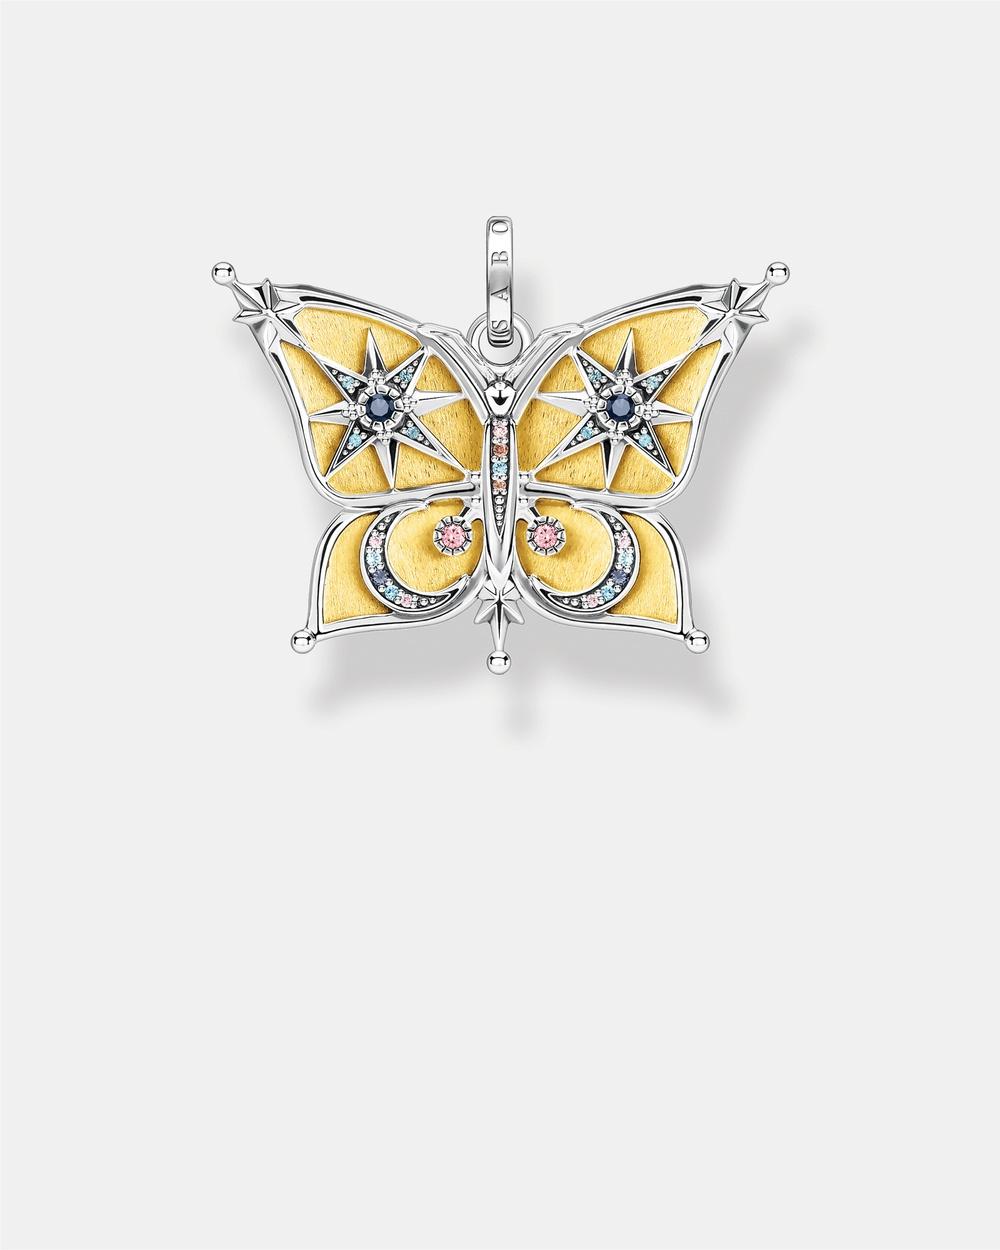 THOMAS SABO Pendant Butterfly Jewellery Multi